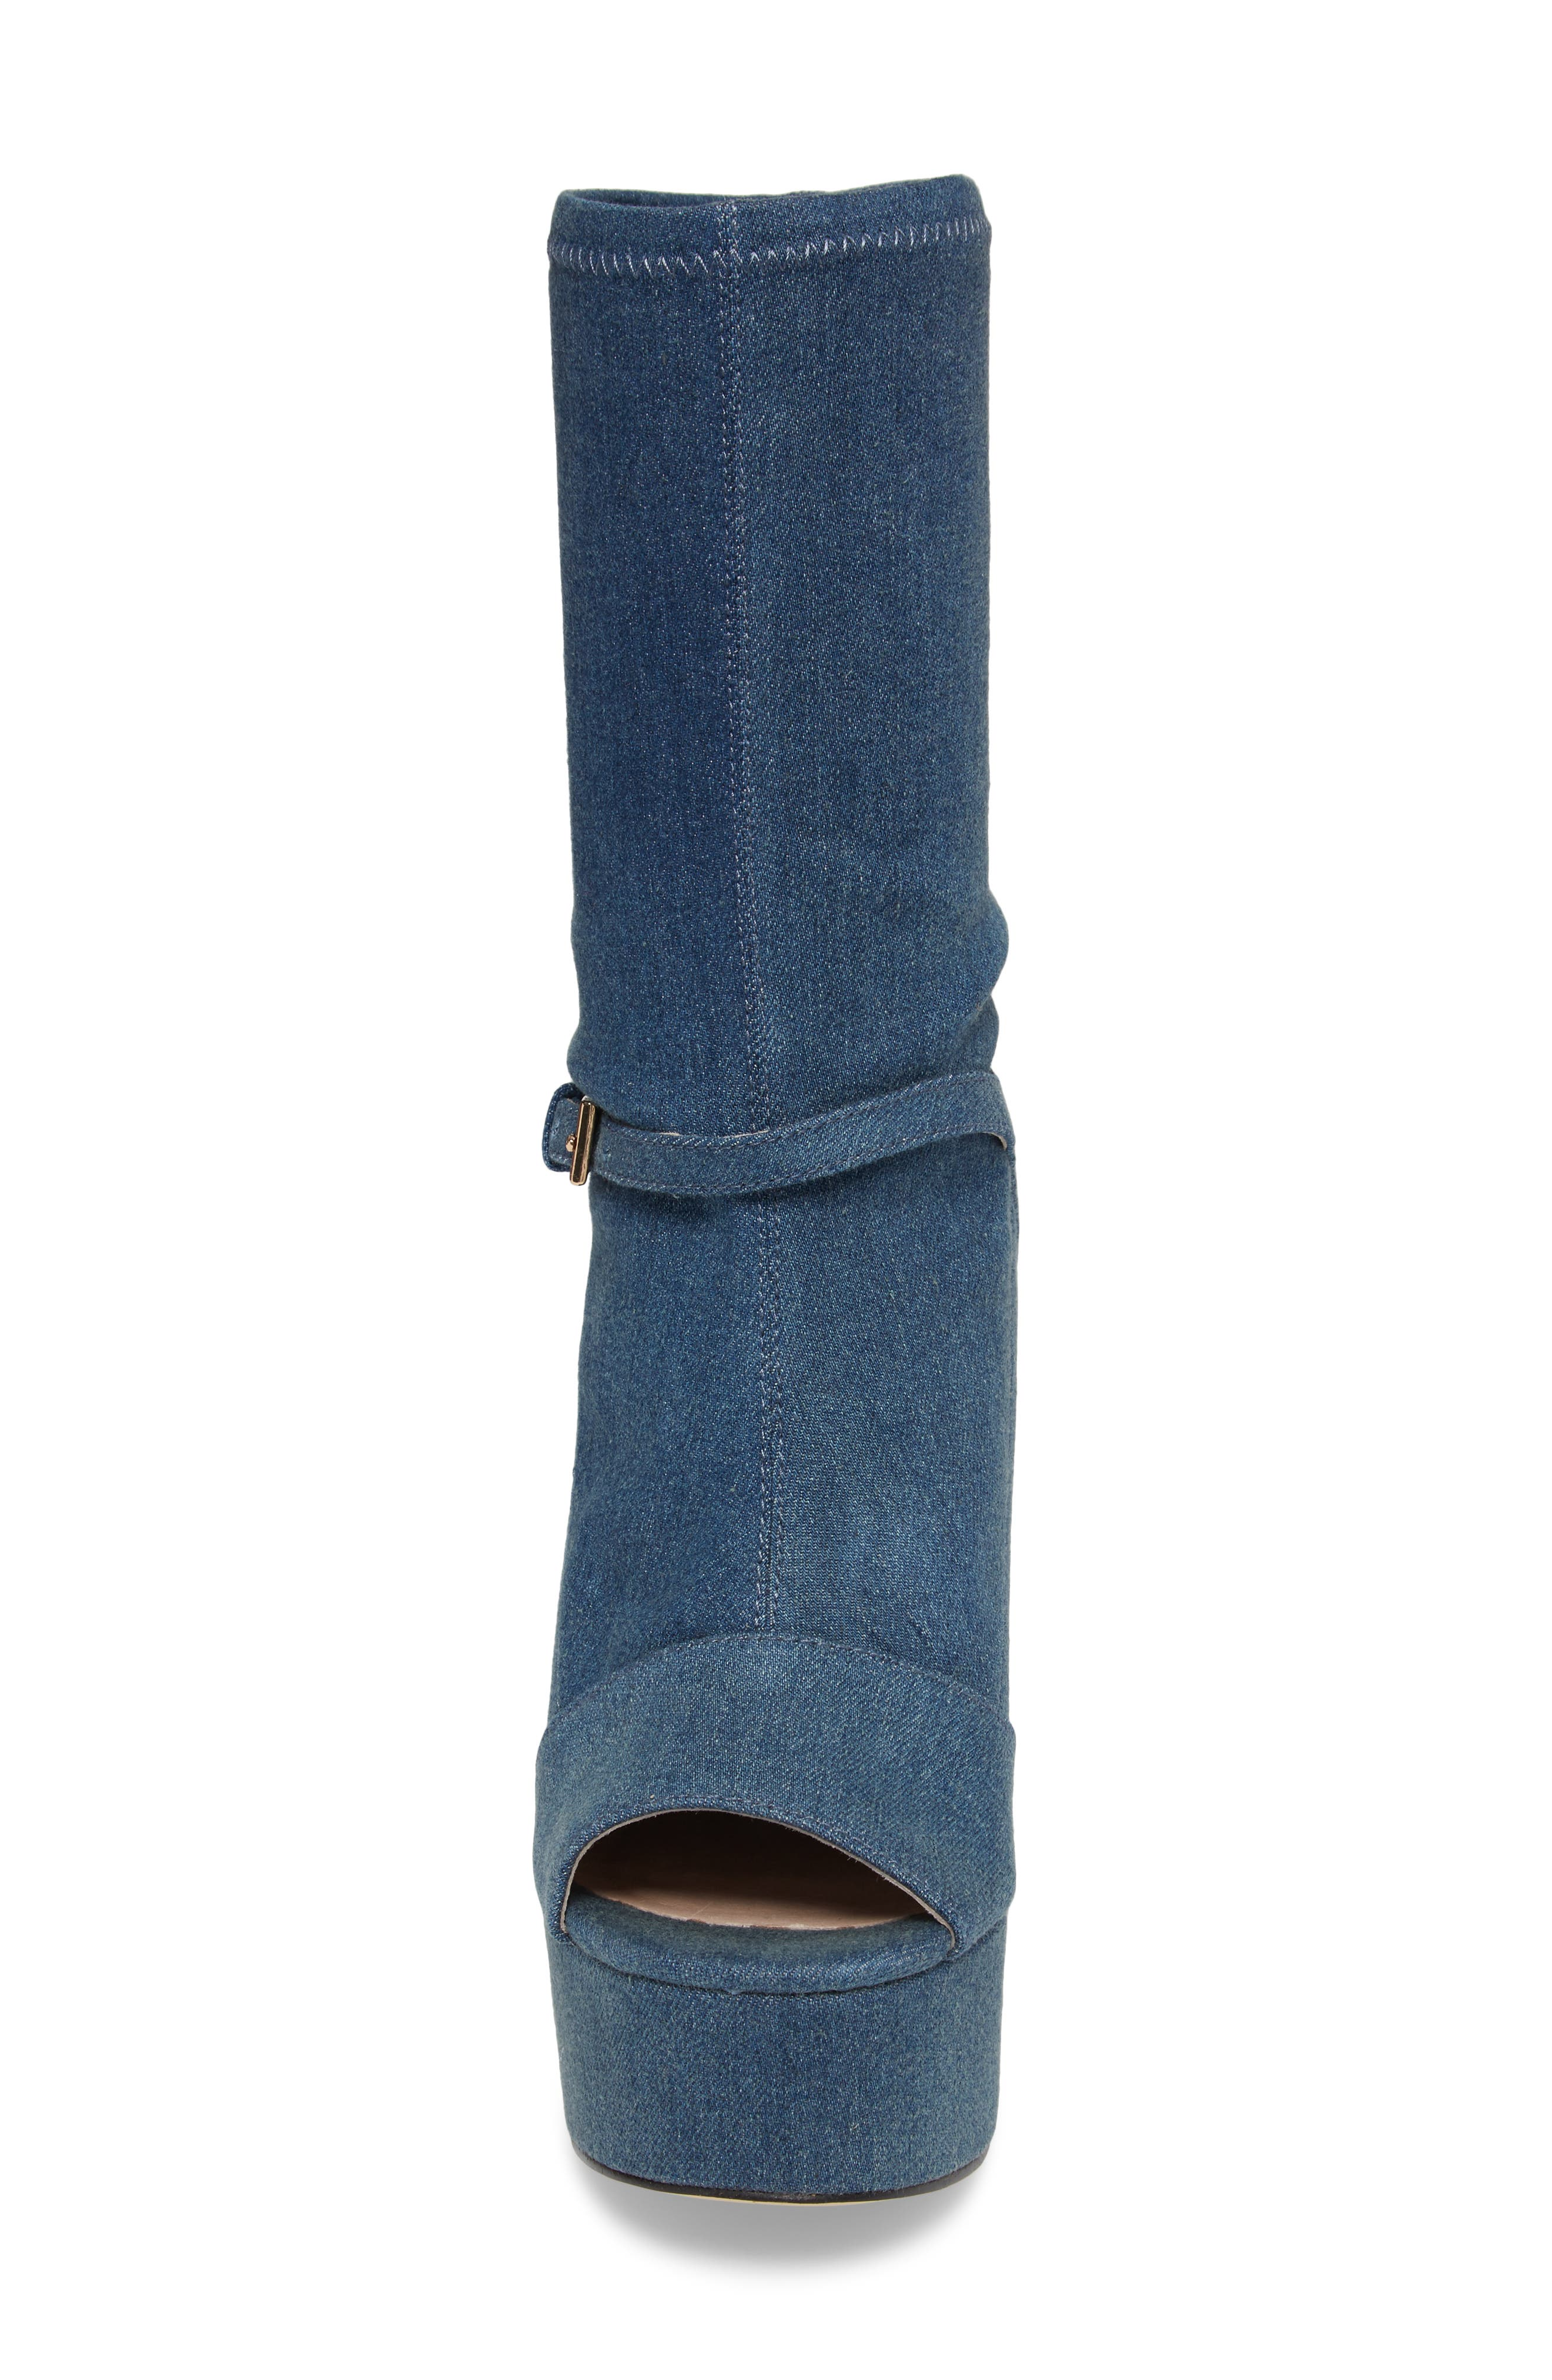 Haimi Sequin Sock Bootie,                             Alternate thumbnail 4, color,                             Denim